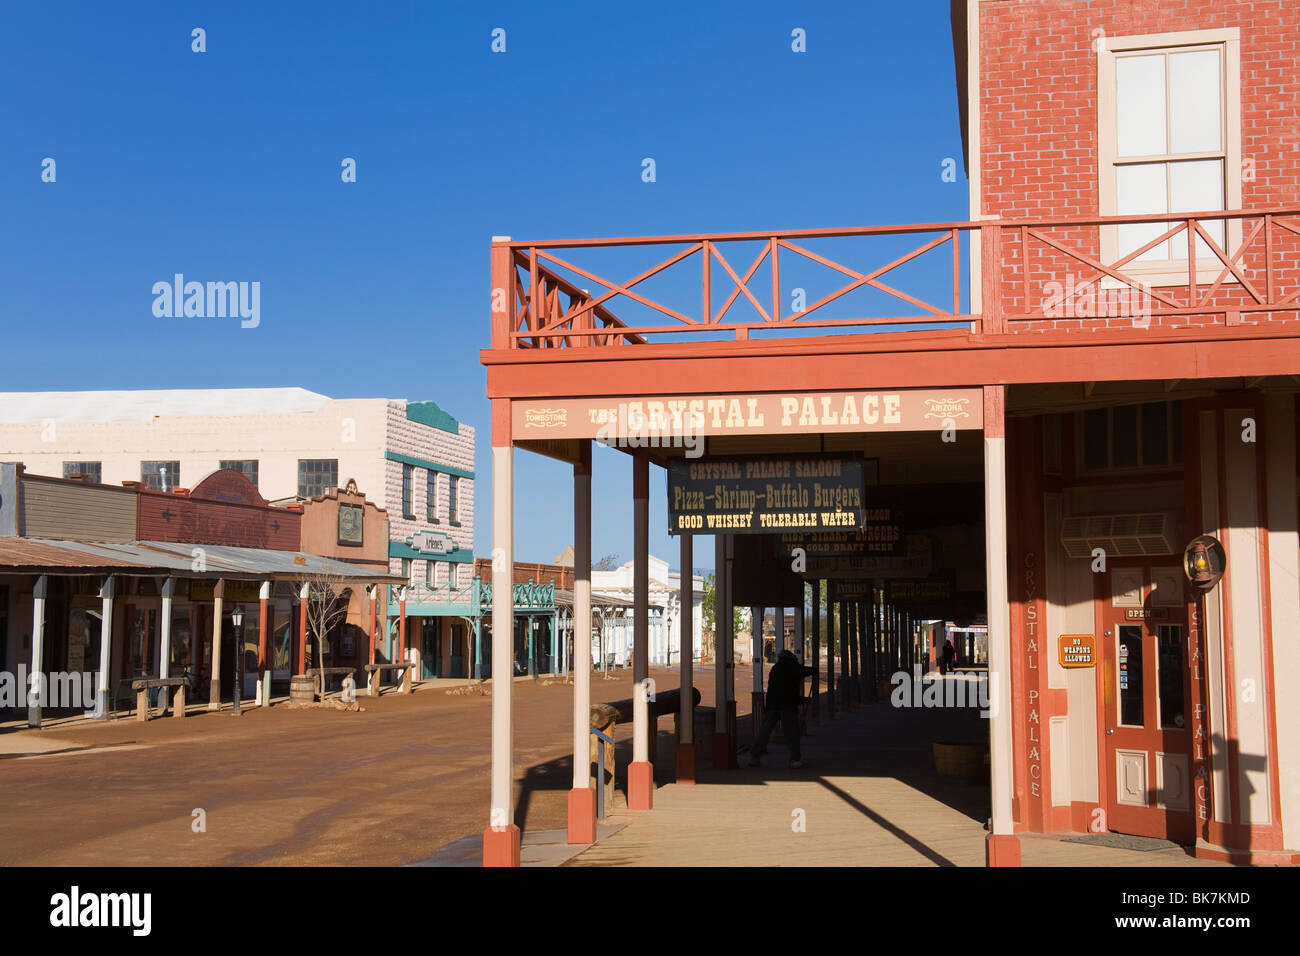 Arizona cochise county cochise - The Crystal Palace Saloon Tombstone Cochise County Arizona United States Of America North America